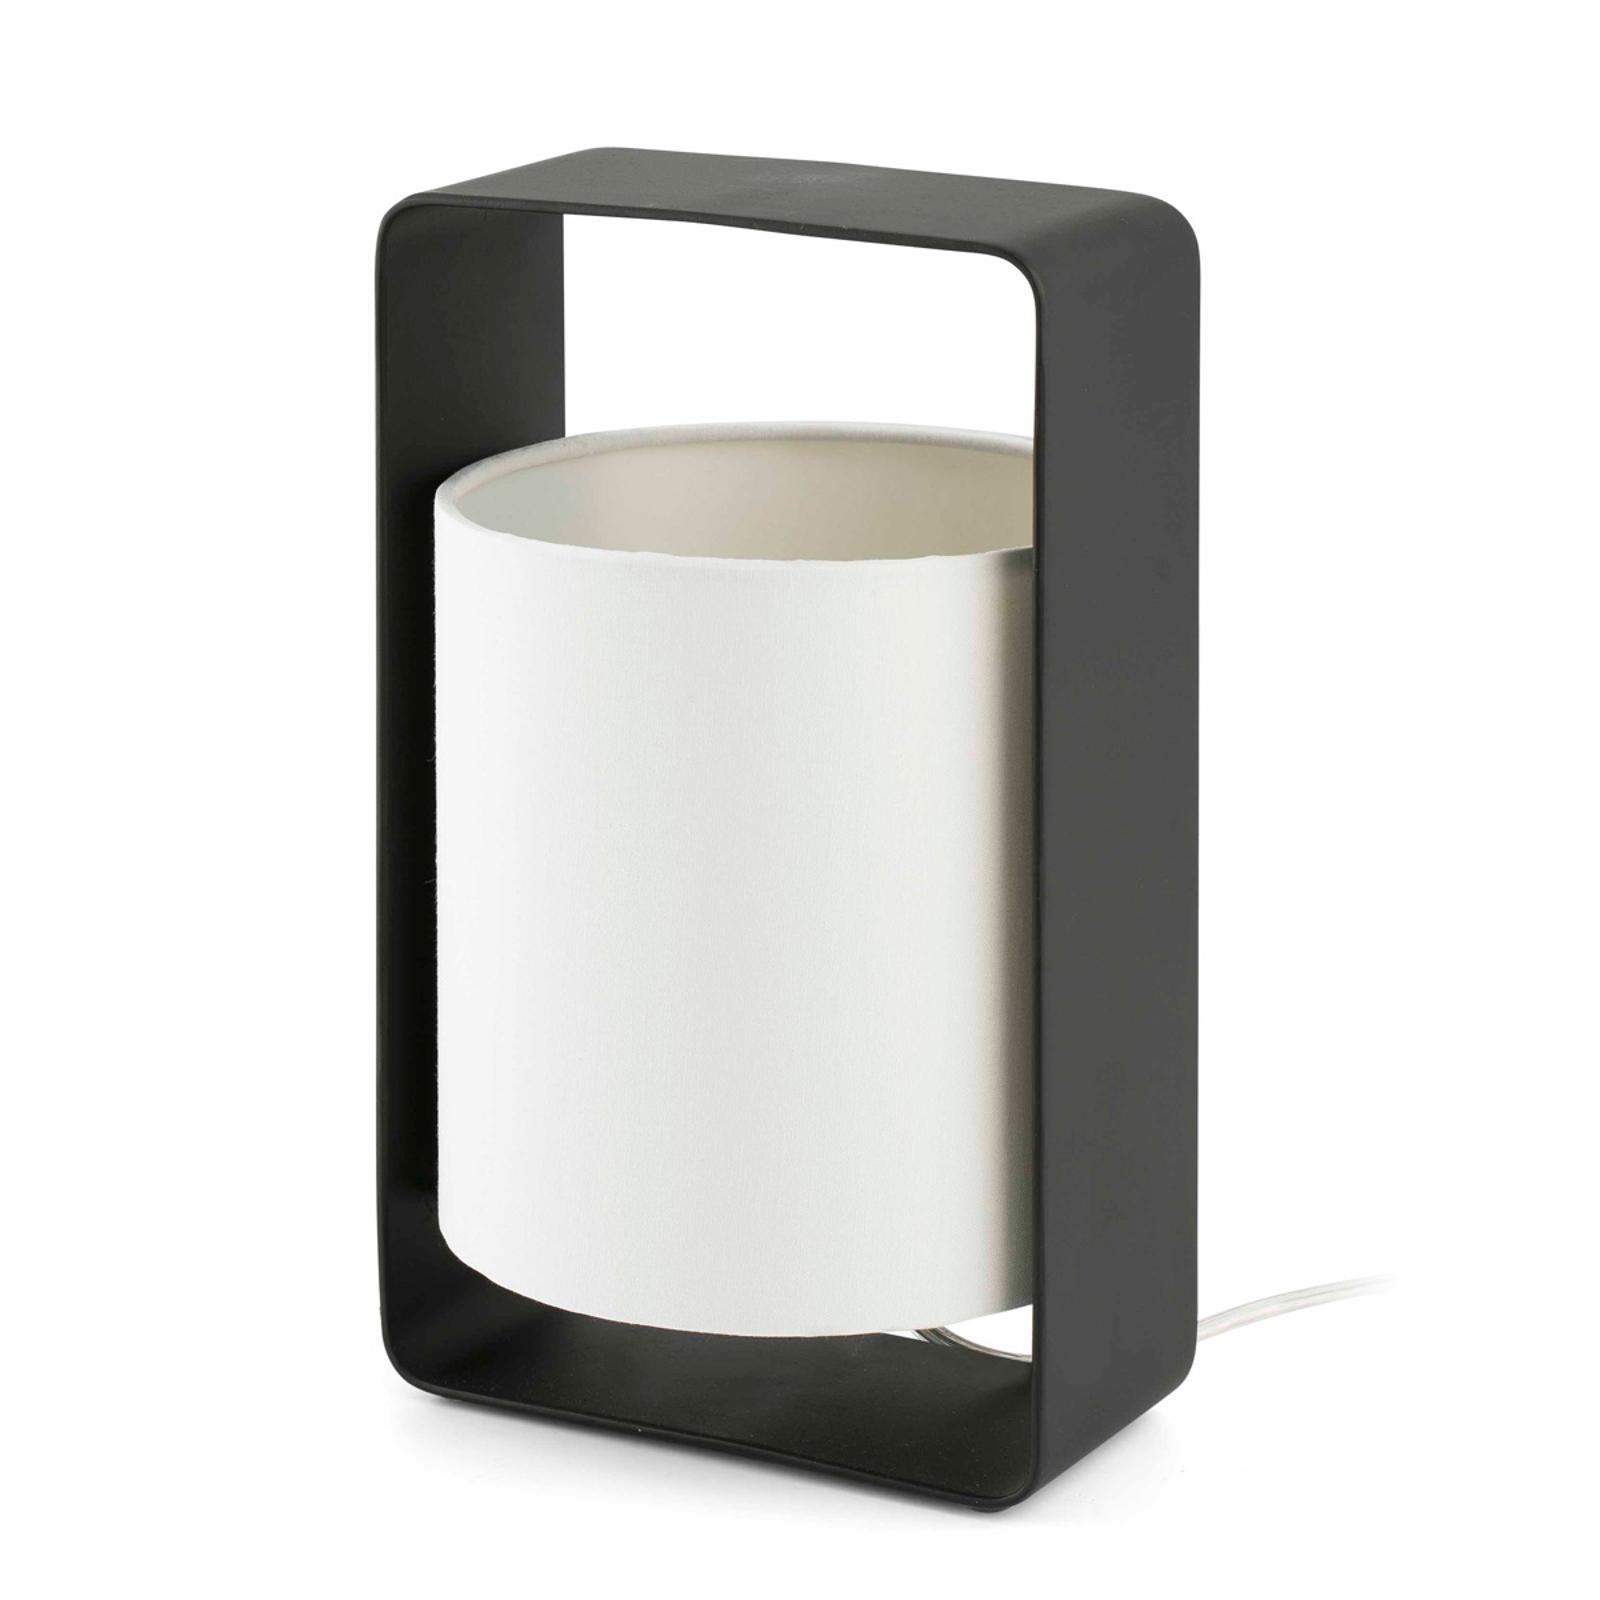 Dekorativ bordslampa Lula, 27 cm